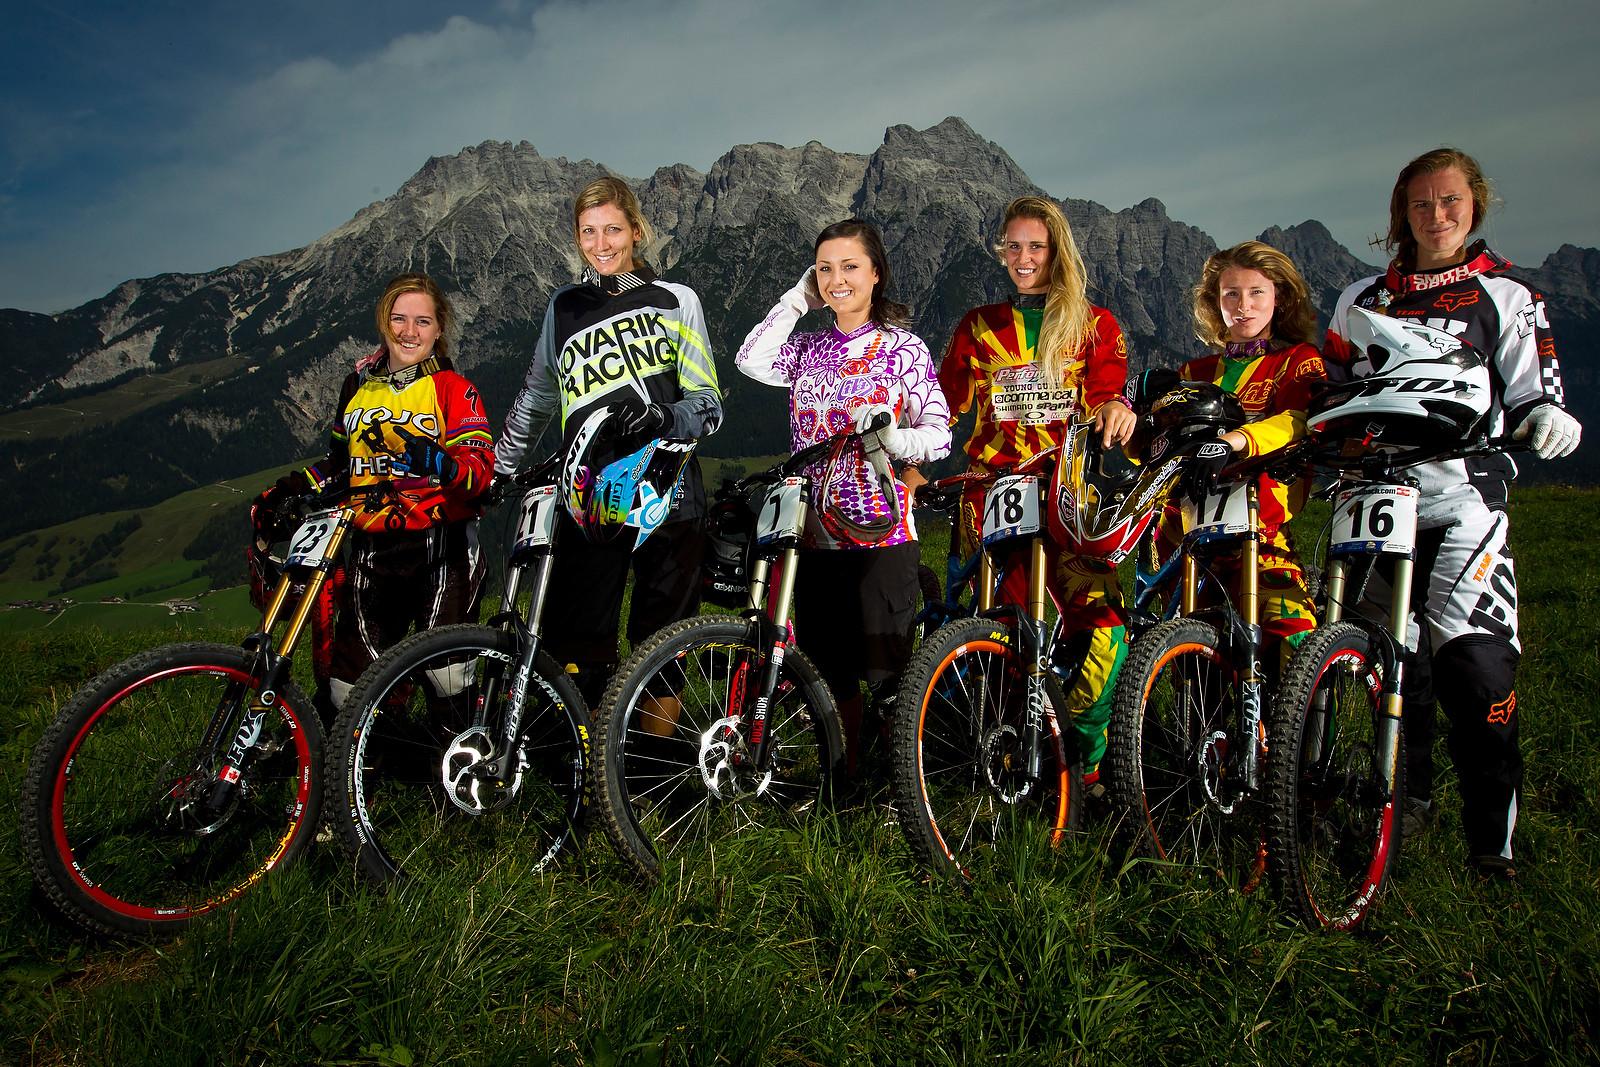 Biker Girl Wallpaper Canadian Hair Models World Championships Riders And